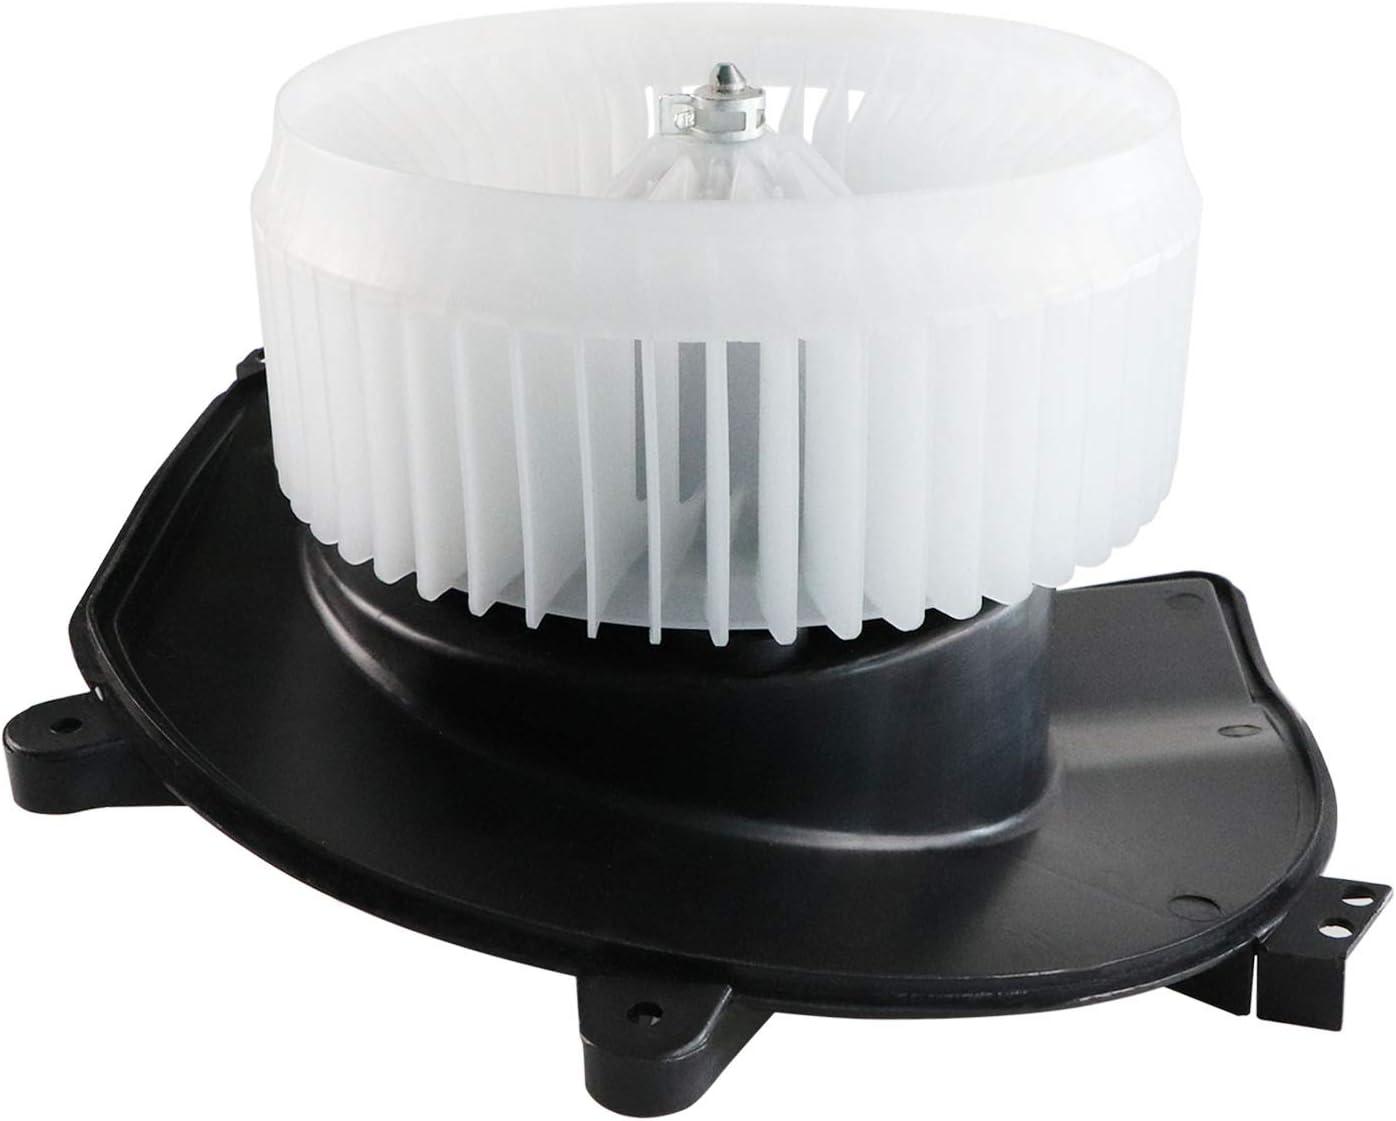 Replaces 89018521 700110 GM3126126 ABS Heater Blower Motor Fan Fits for Buick LeSabre//Cadillac Deville//Pontiac Bonneville 2002 2003 2004 2005 Oldsmobile Aurora 2002-2003 Cadillac Seville 2003-2004